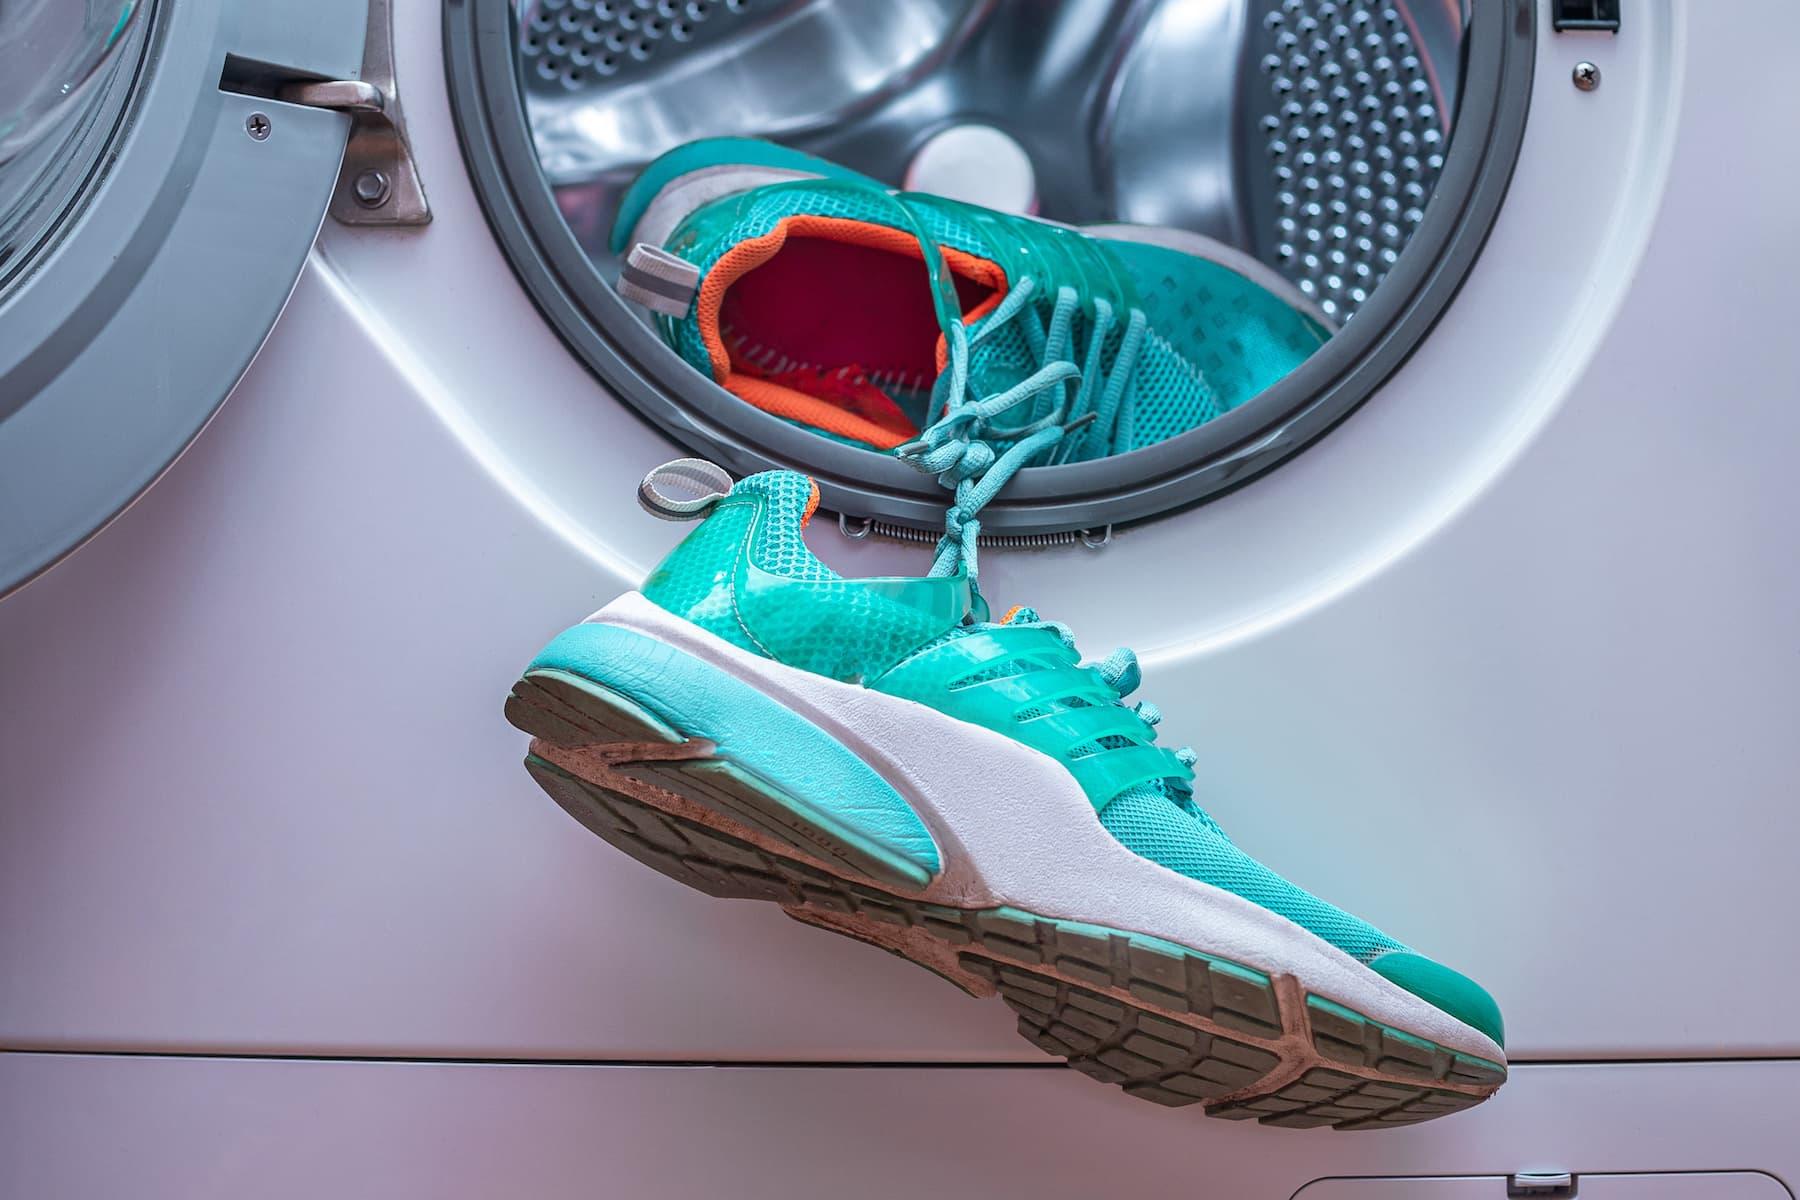 buty w pralce